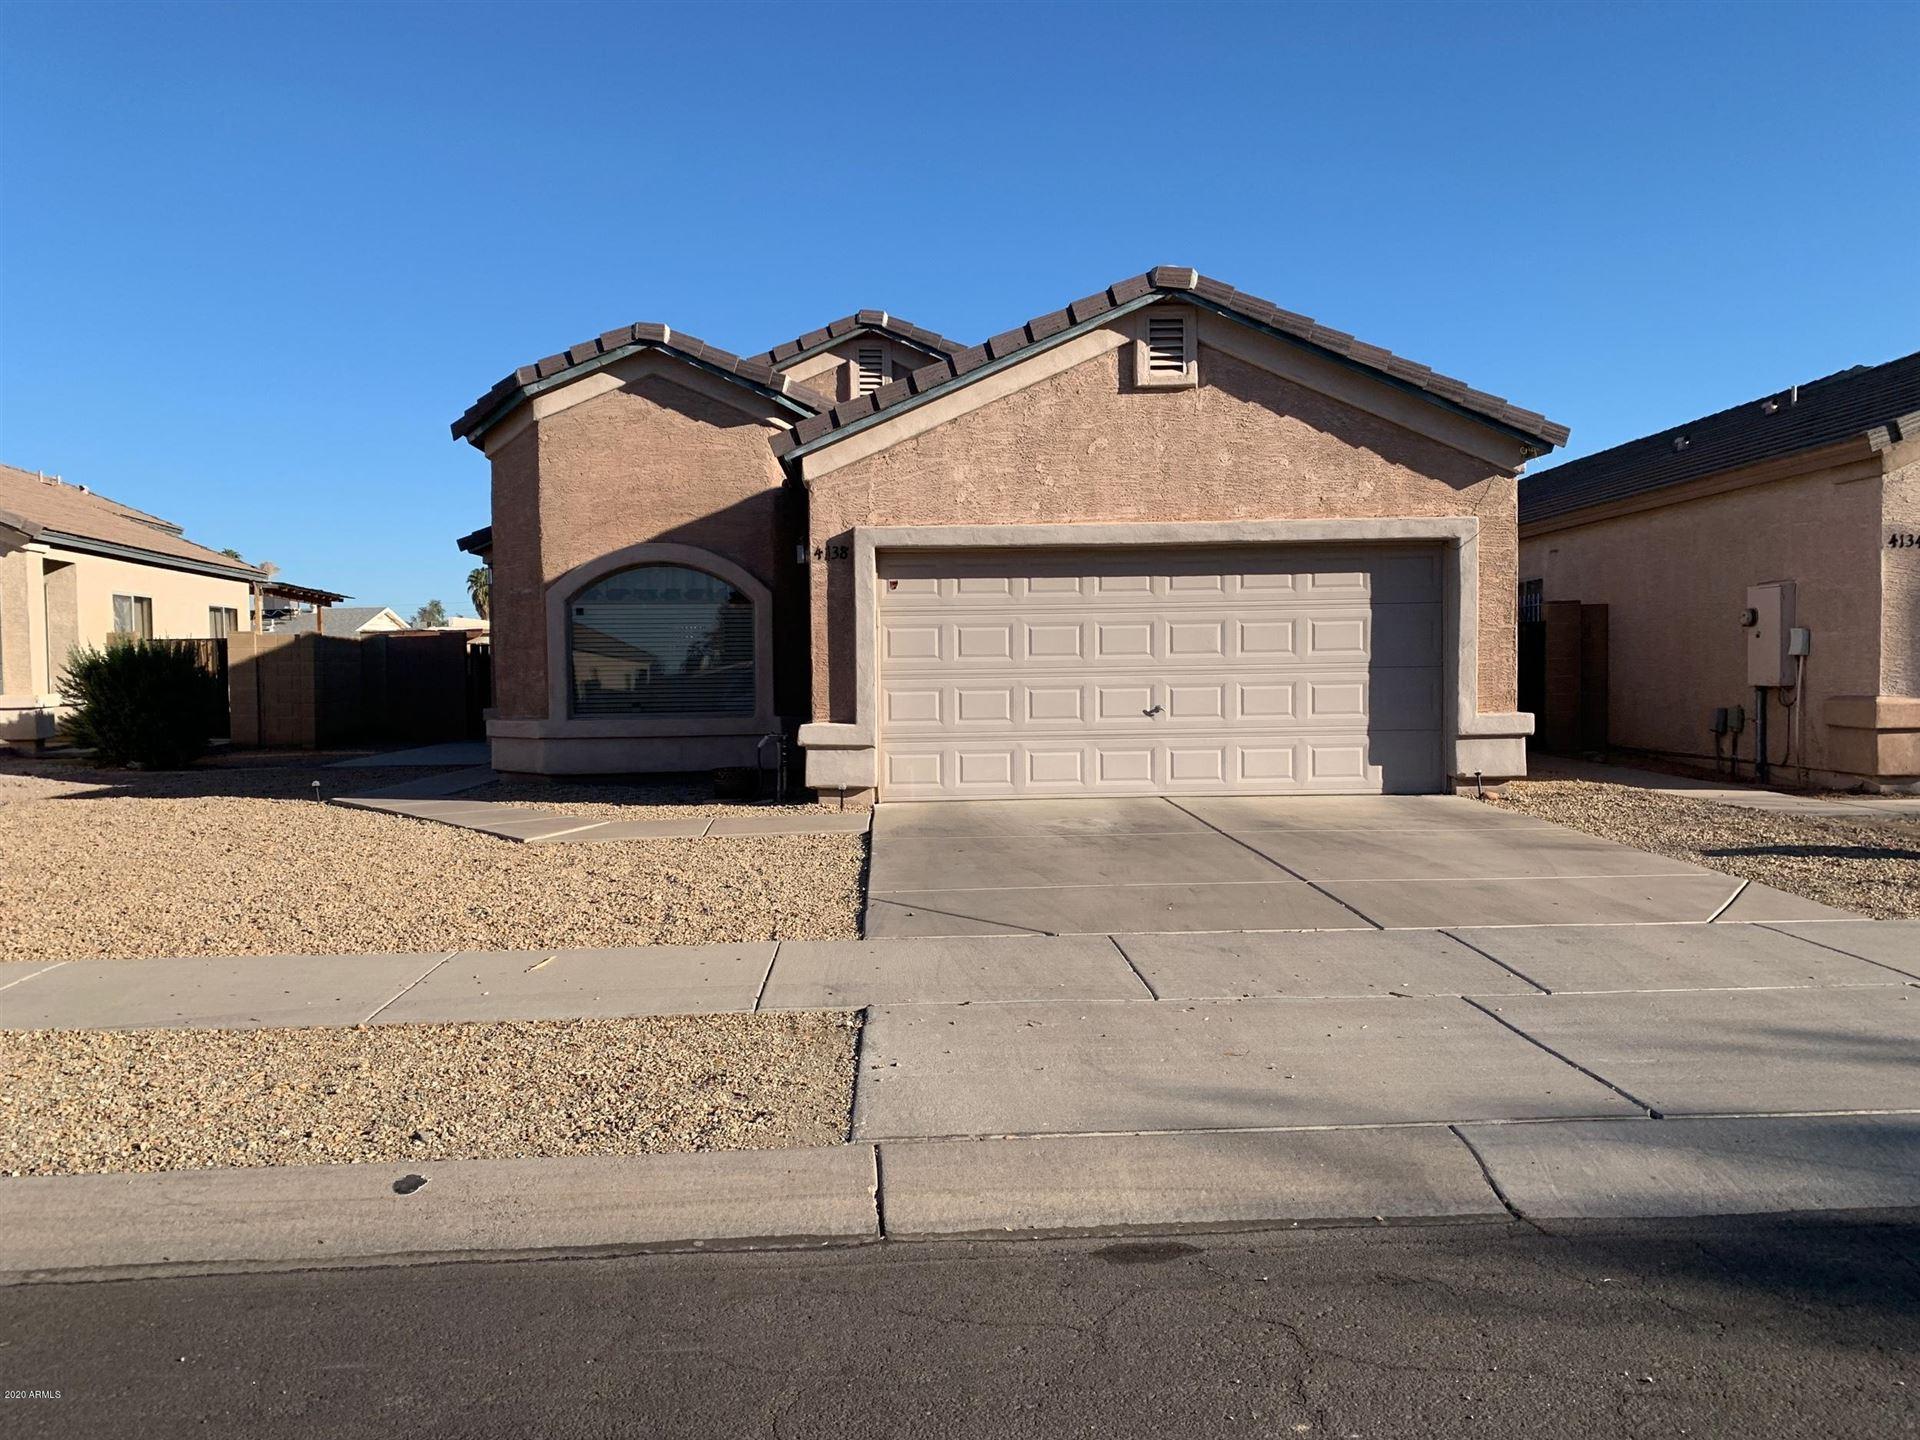 4138 W OREGON Avenue, Phoenix, AZ 85019 - MLS#: 6255587